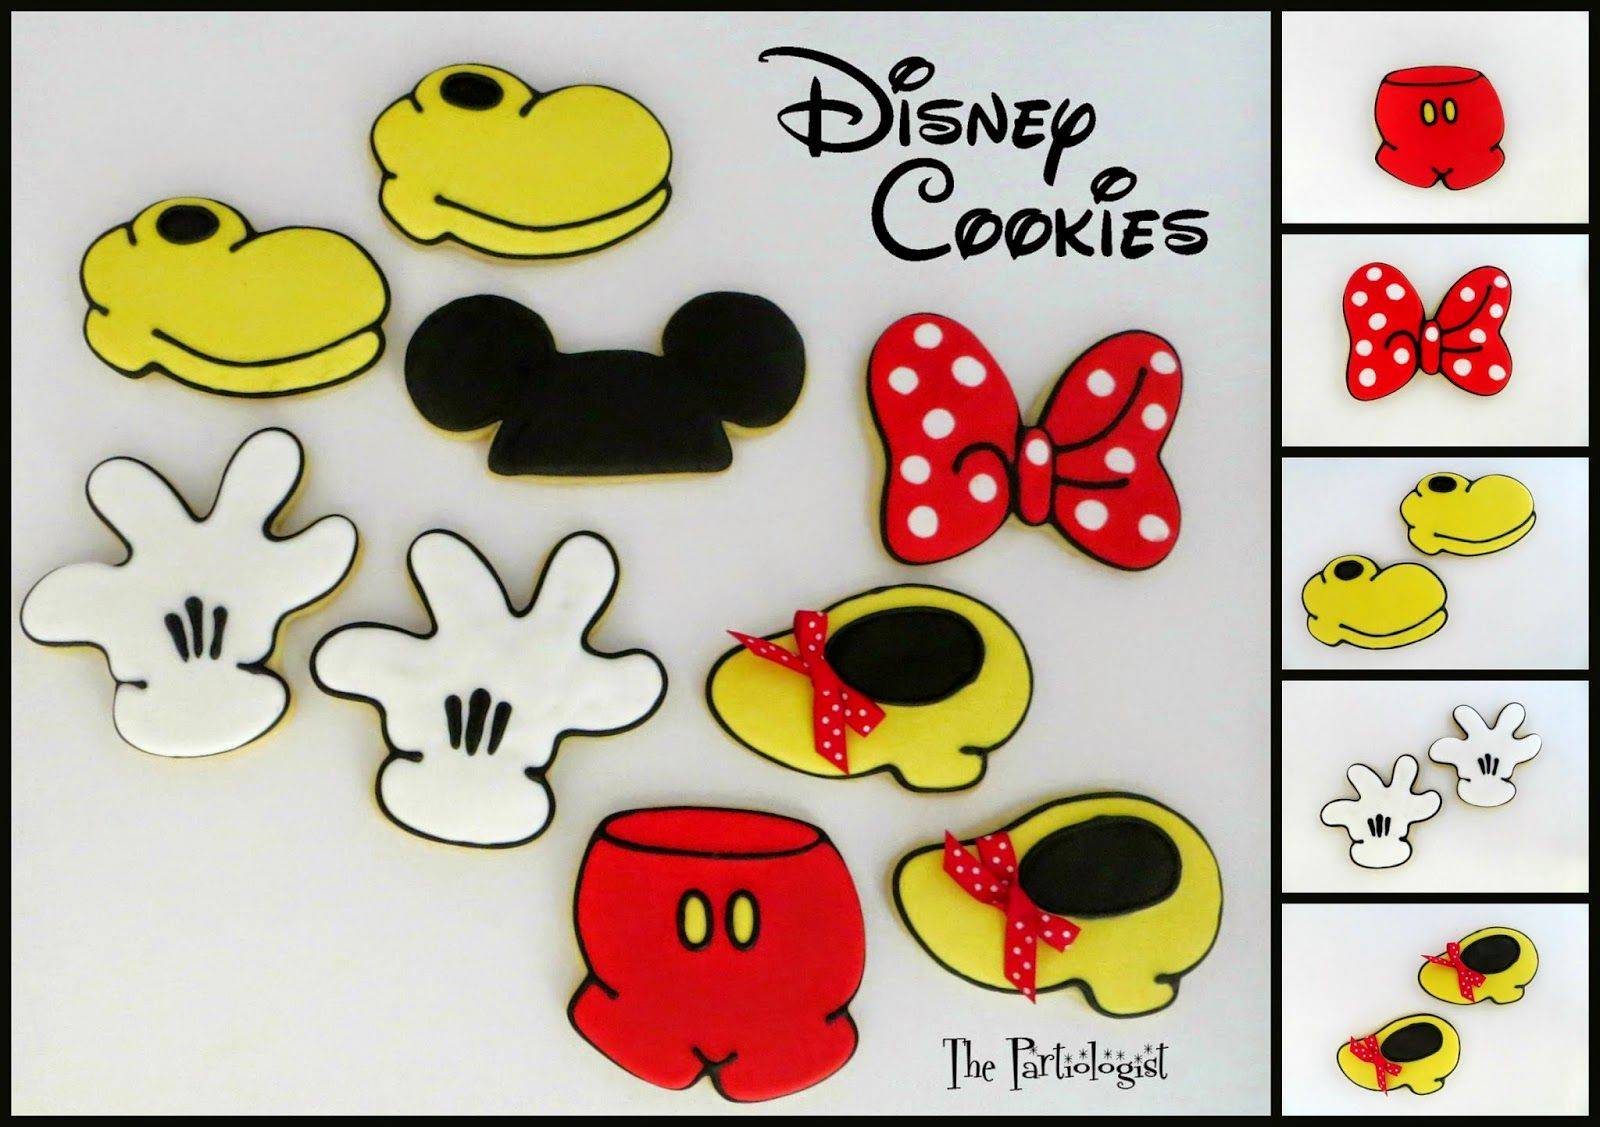 The Partiologist: Disney Cookies!